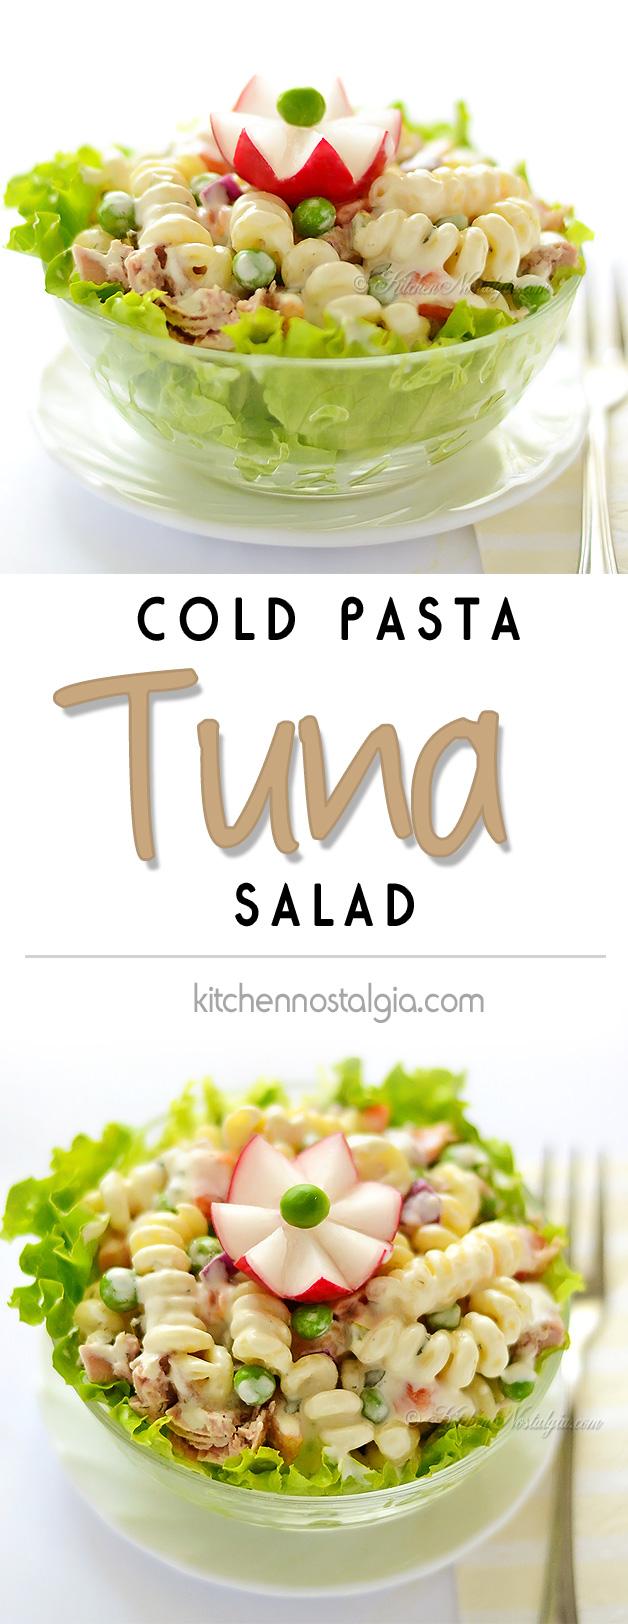 Cold tuna macaroni salad Pasta salad recipe cold